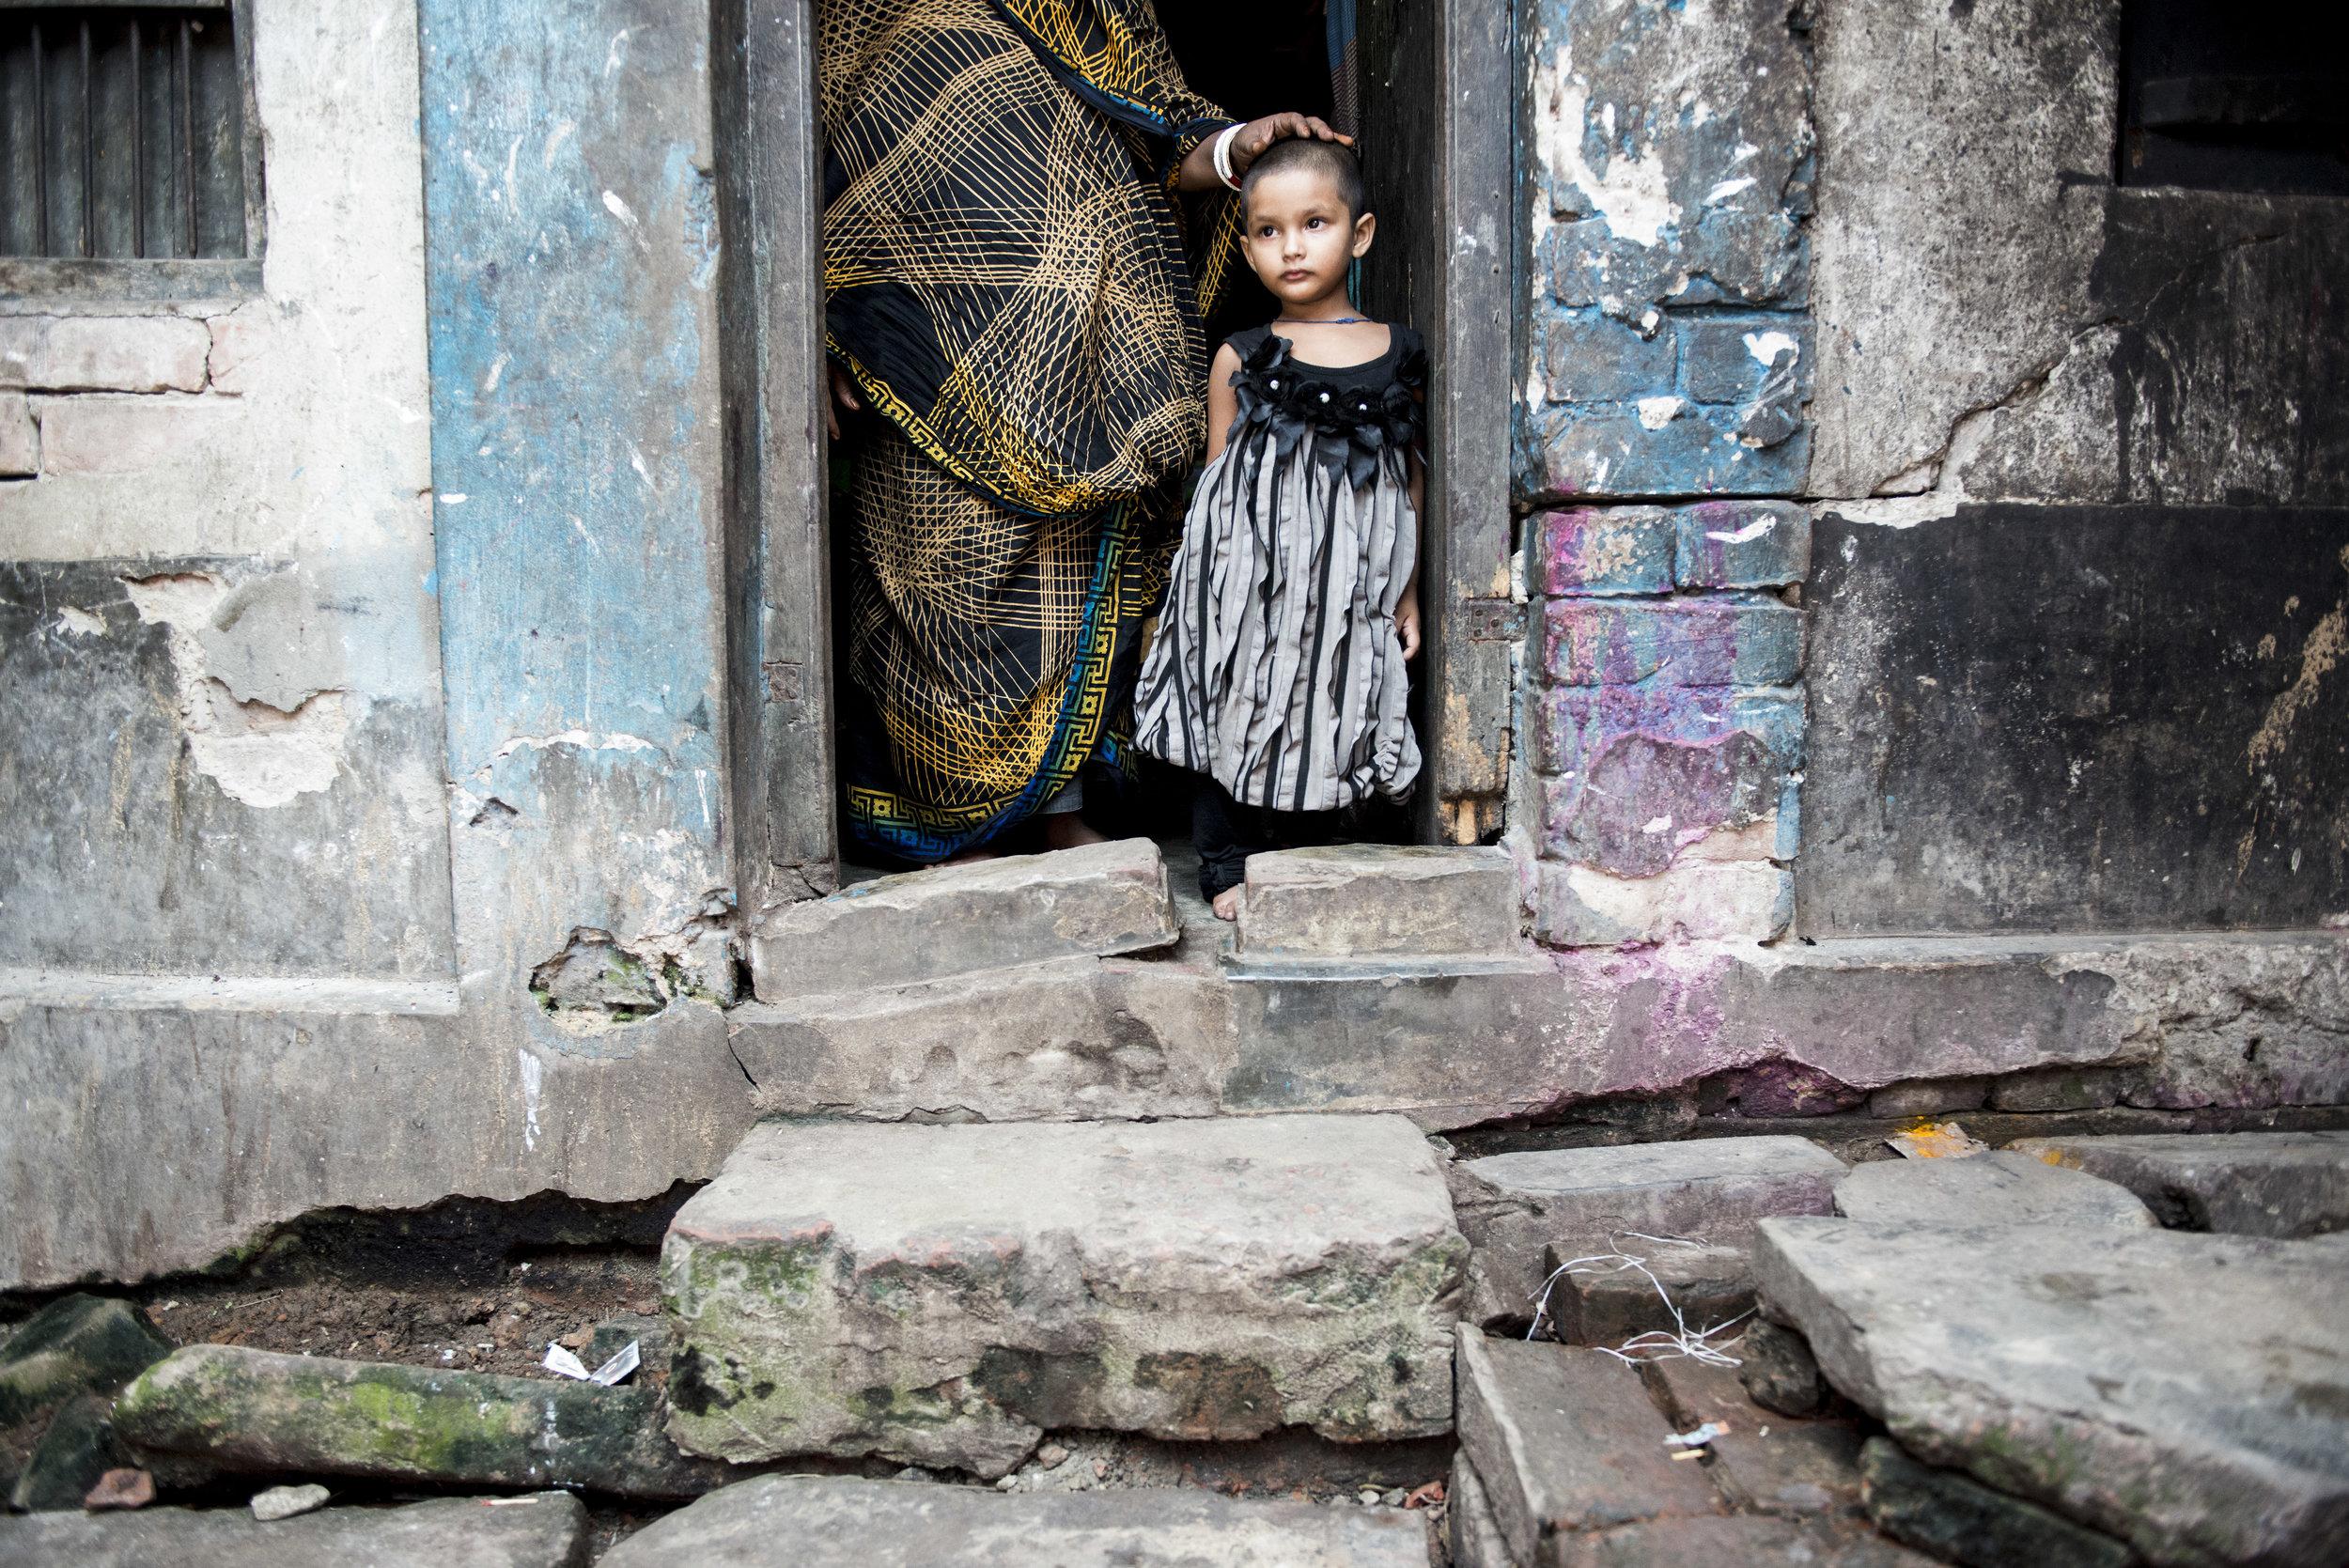 Mother and child, Daulatdia brothel. Bangladesh. 2014.